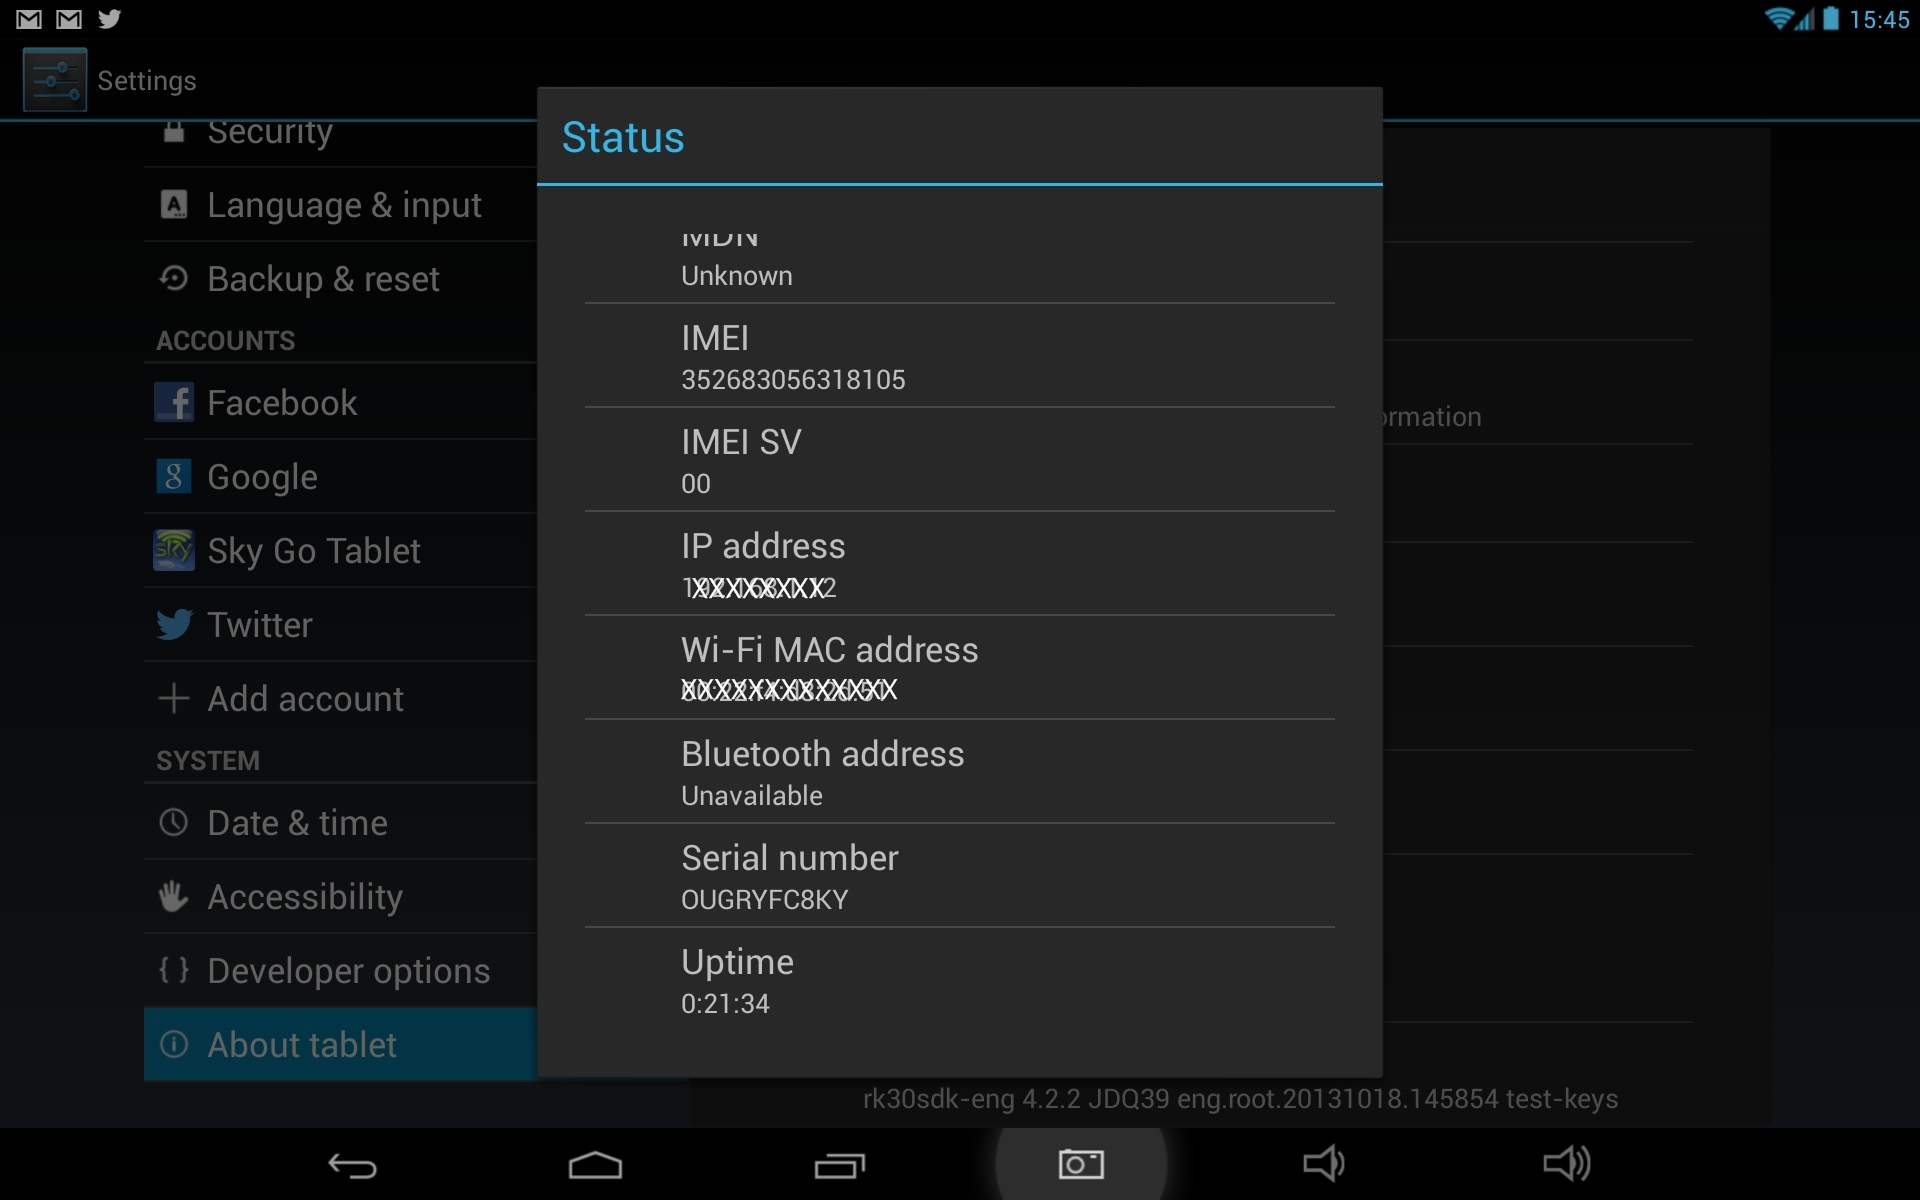 Screenshot-Status.jpg